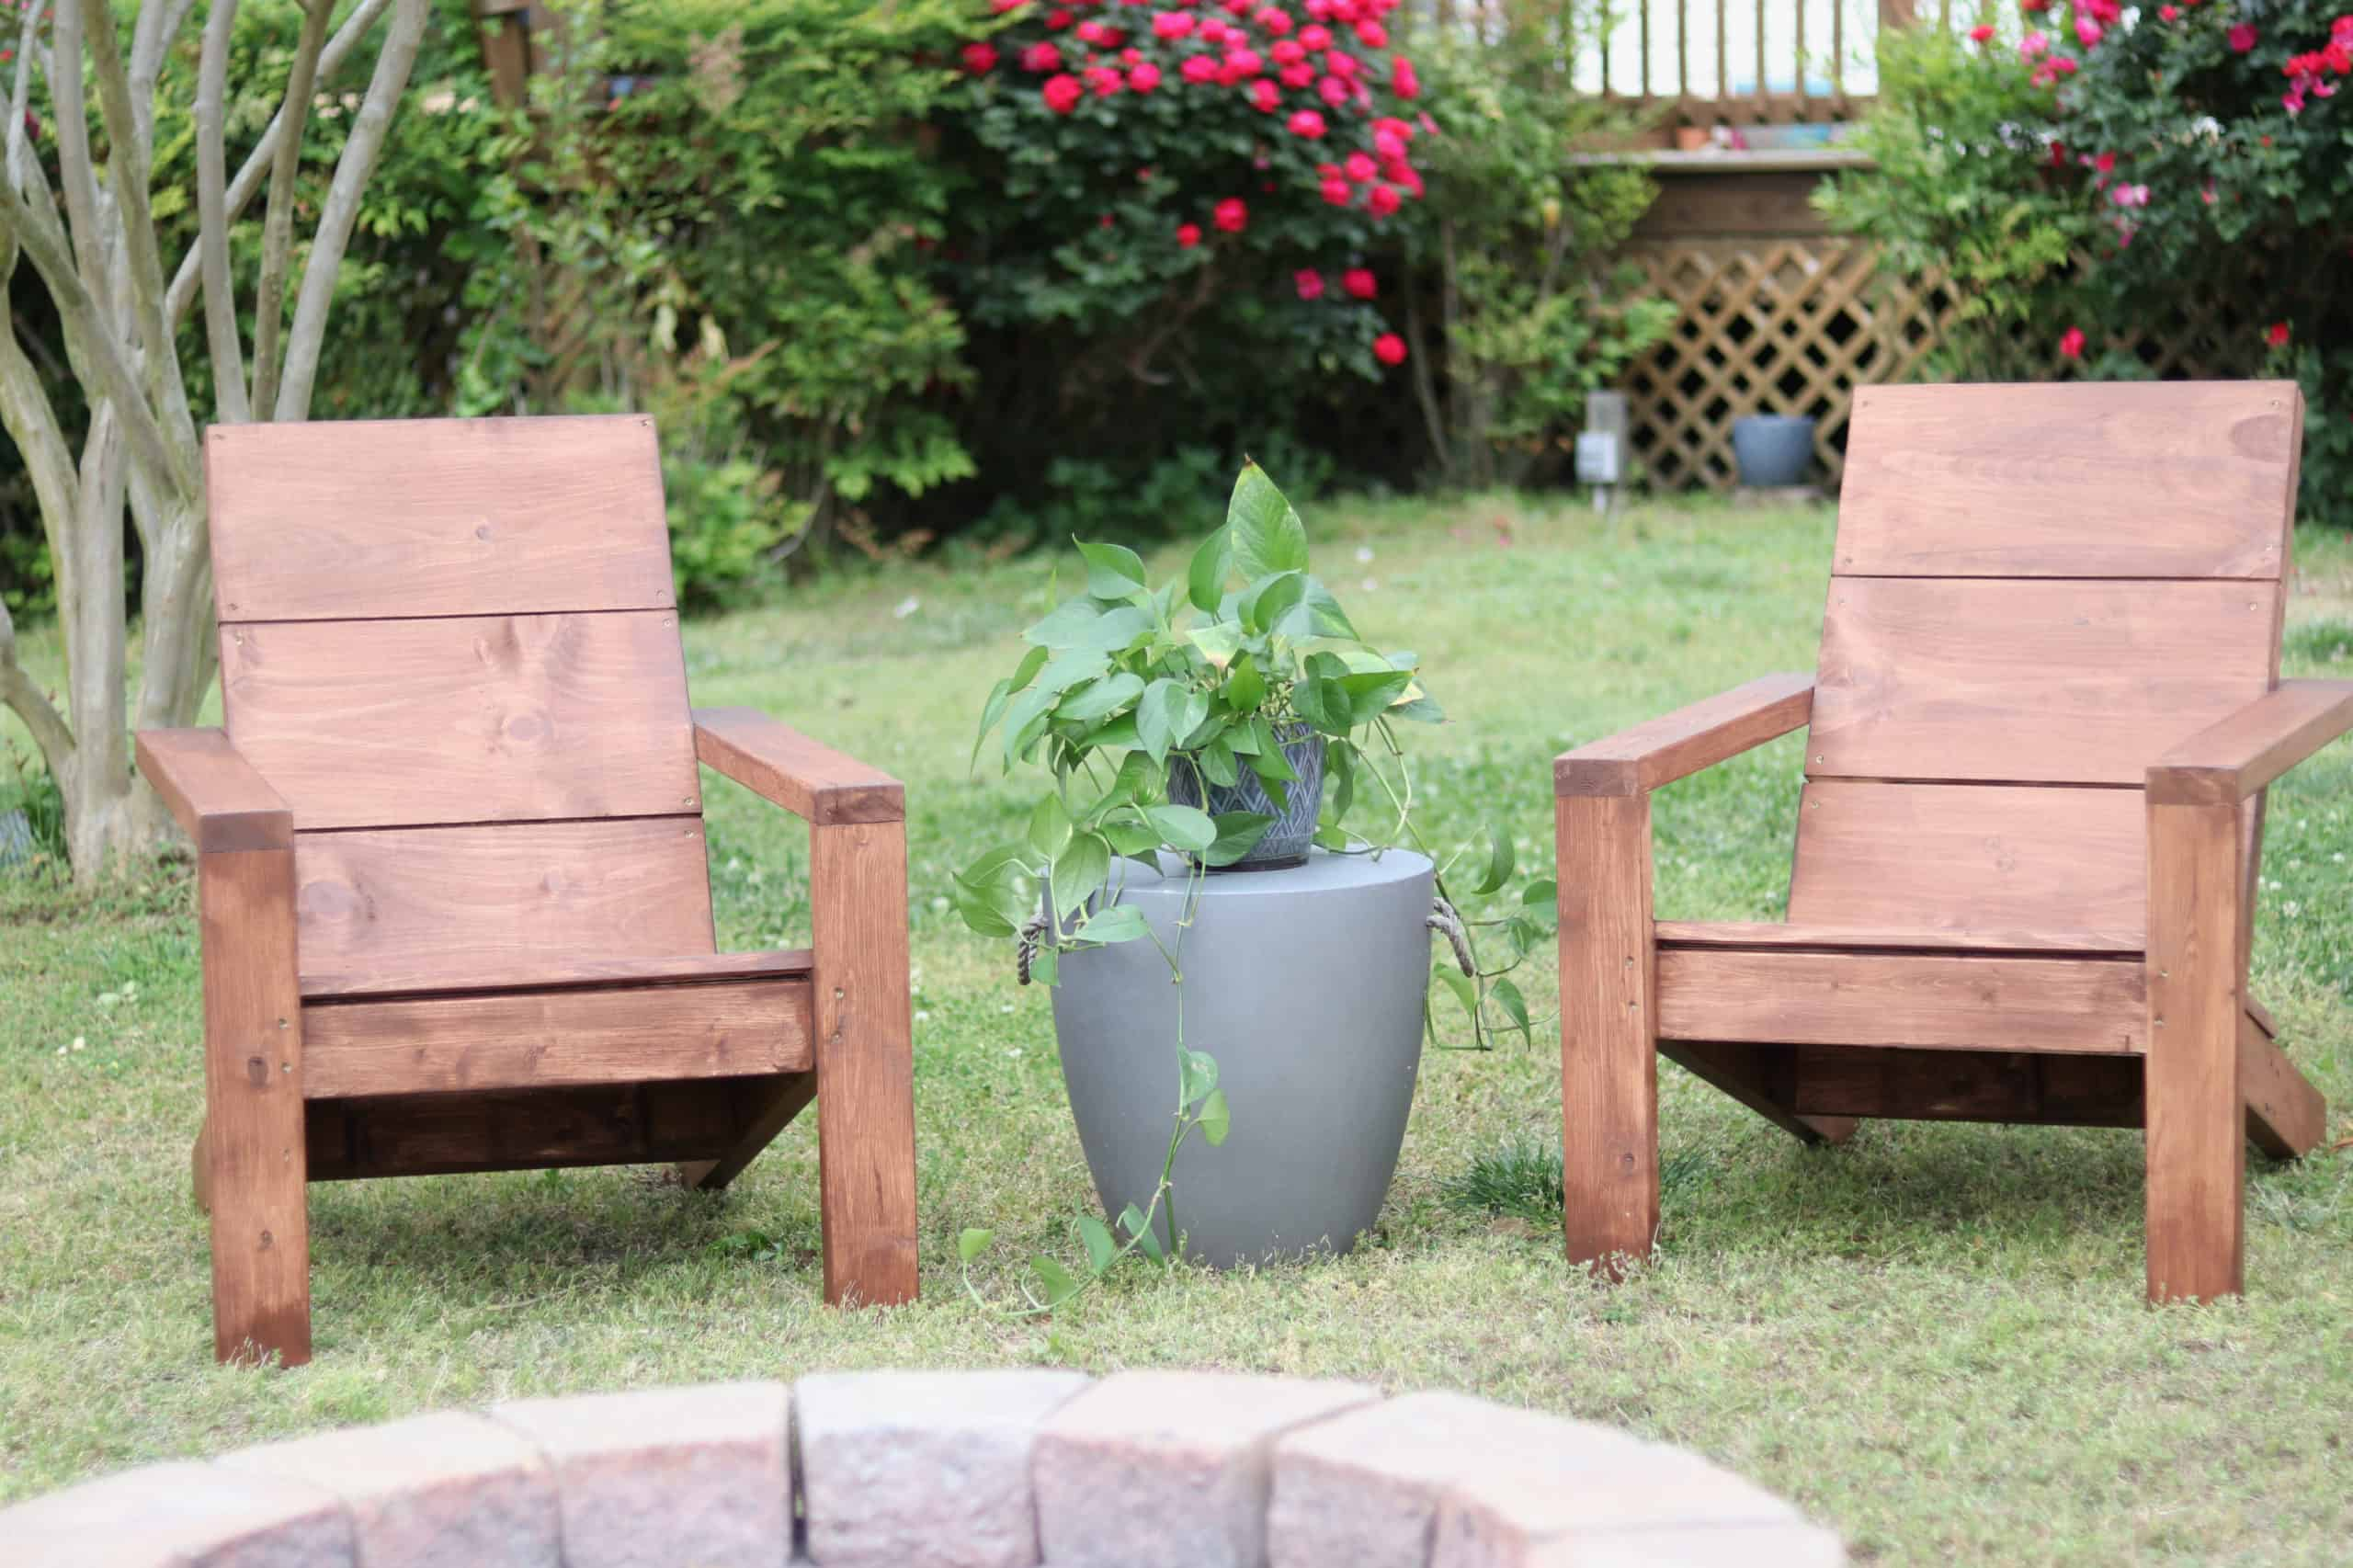 How To Build 2×4 Adirondack Chairs